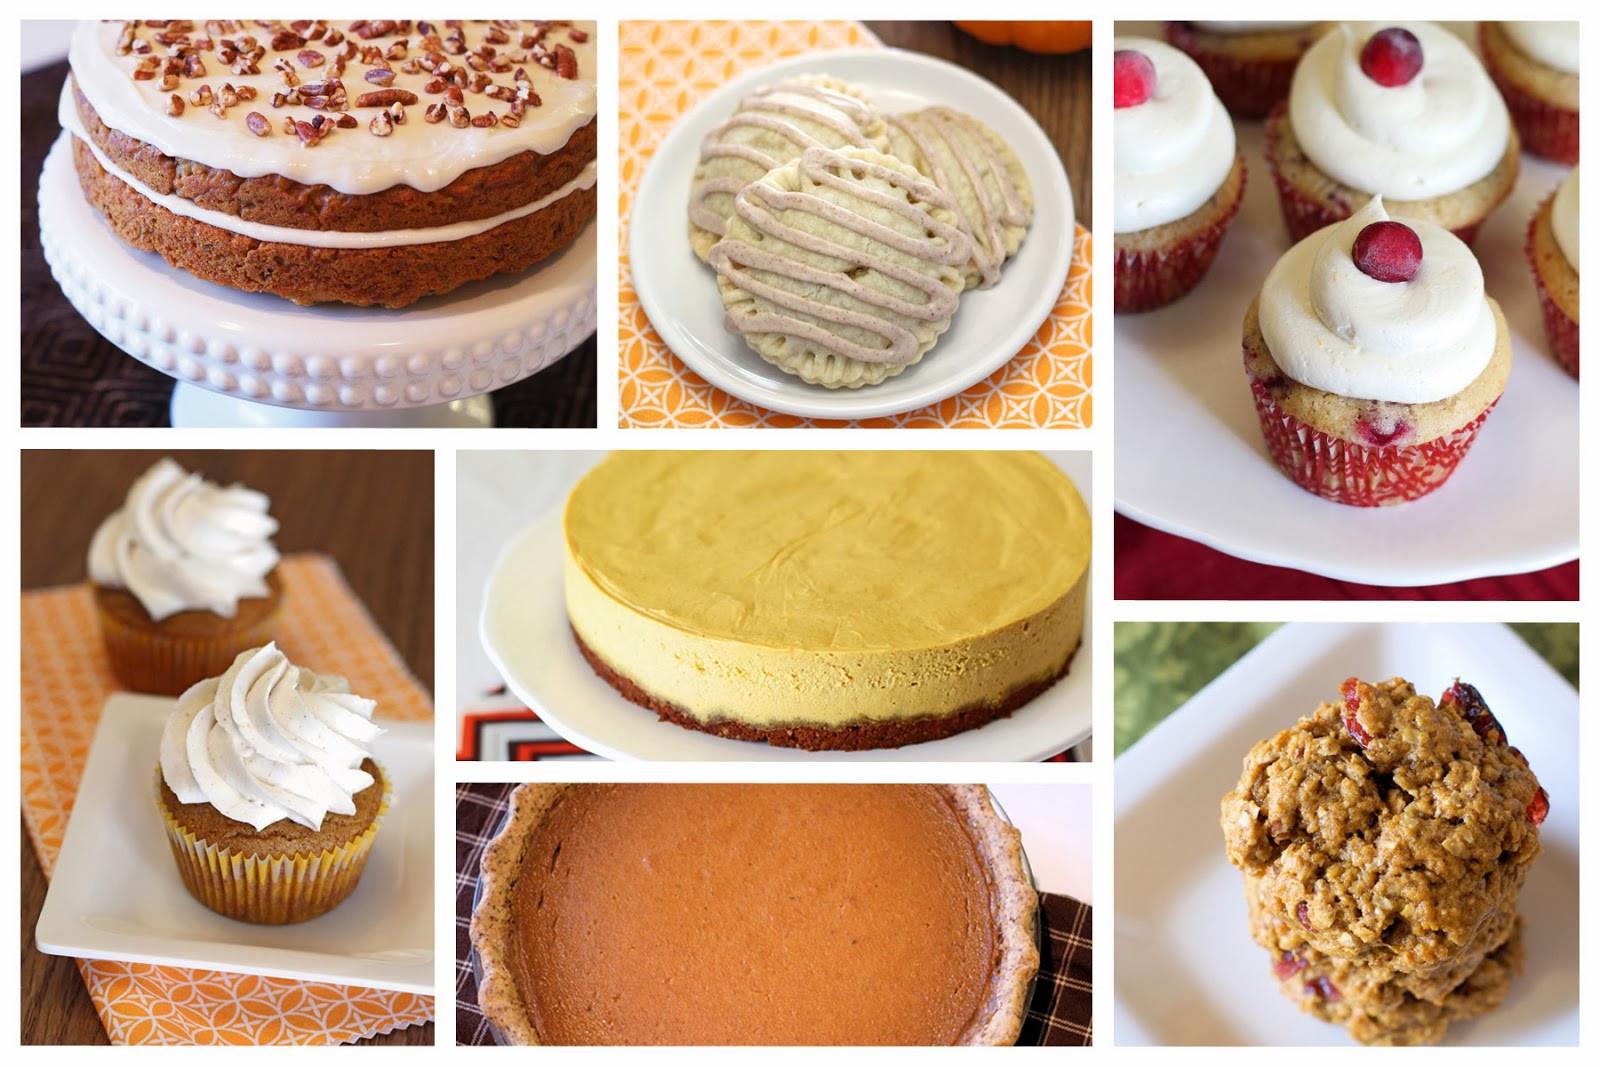 Gluten Free Thanksgiving Dessert  gluten free vegan thanksgiving desserts Sarah Bakes